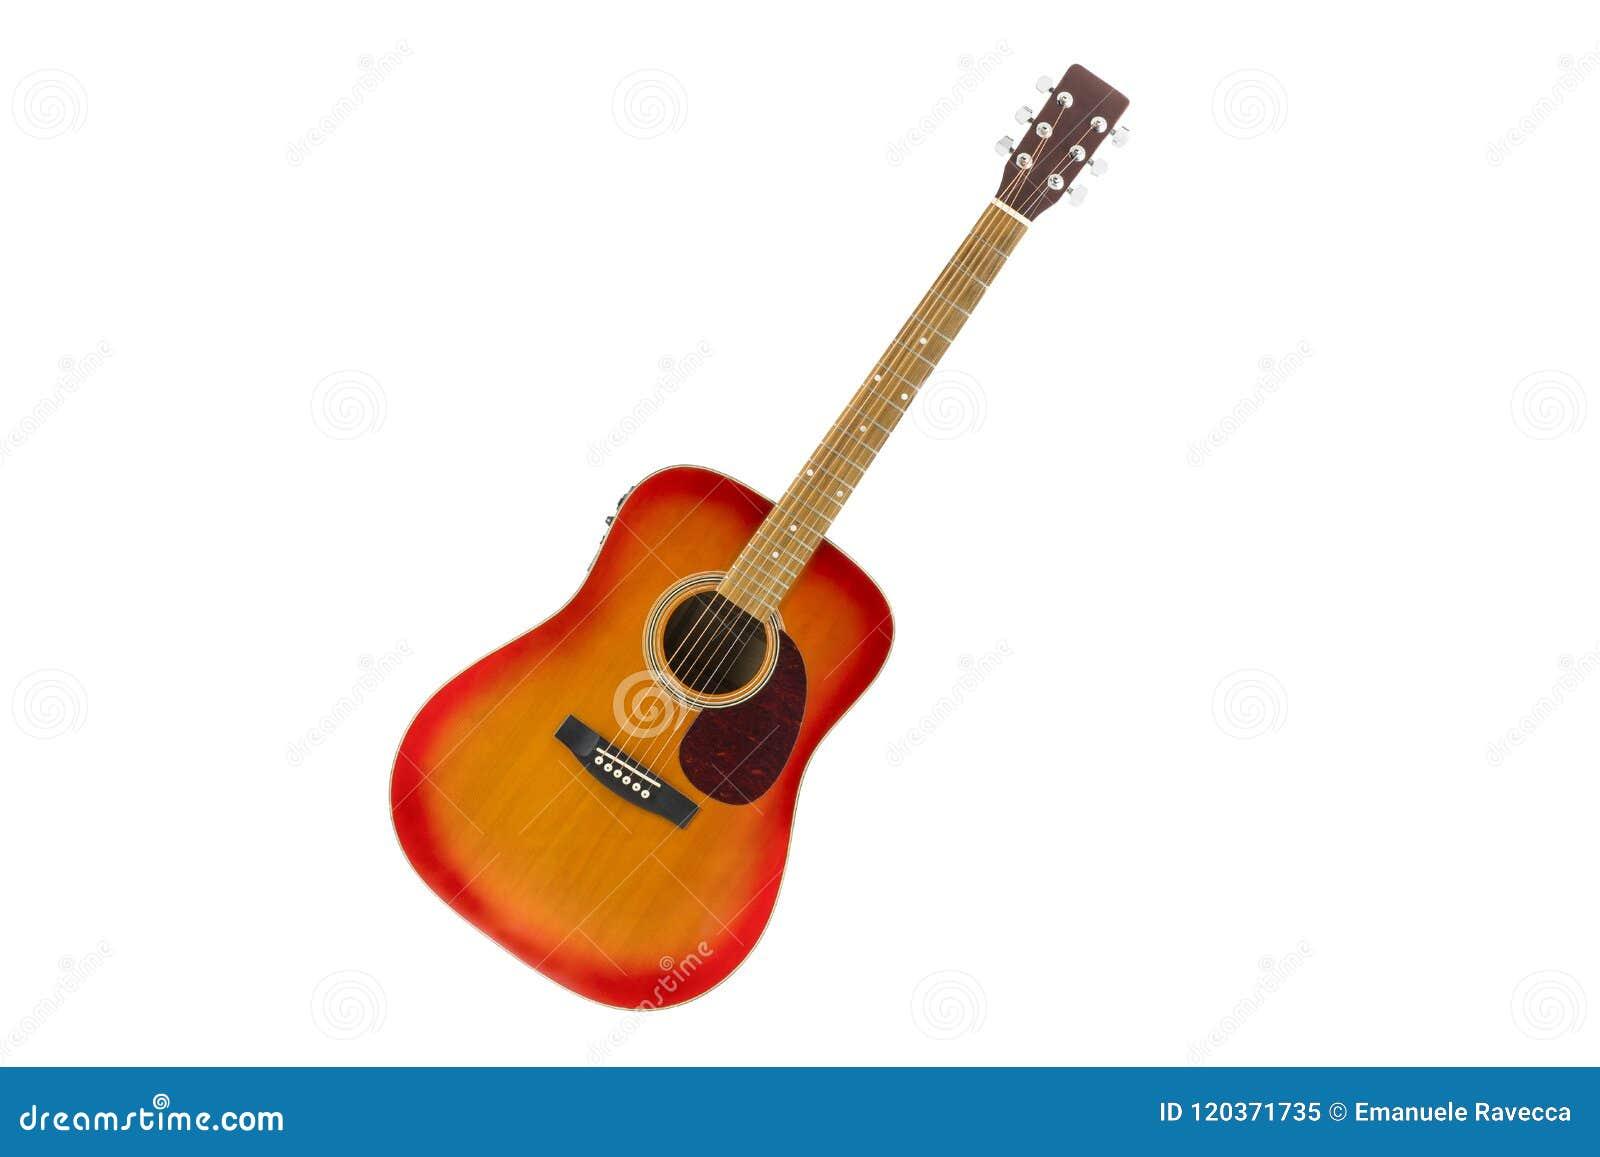 Cherry Sunburst Acoustic Guitar In White Background Stock Image